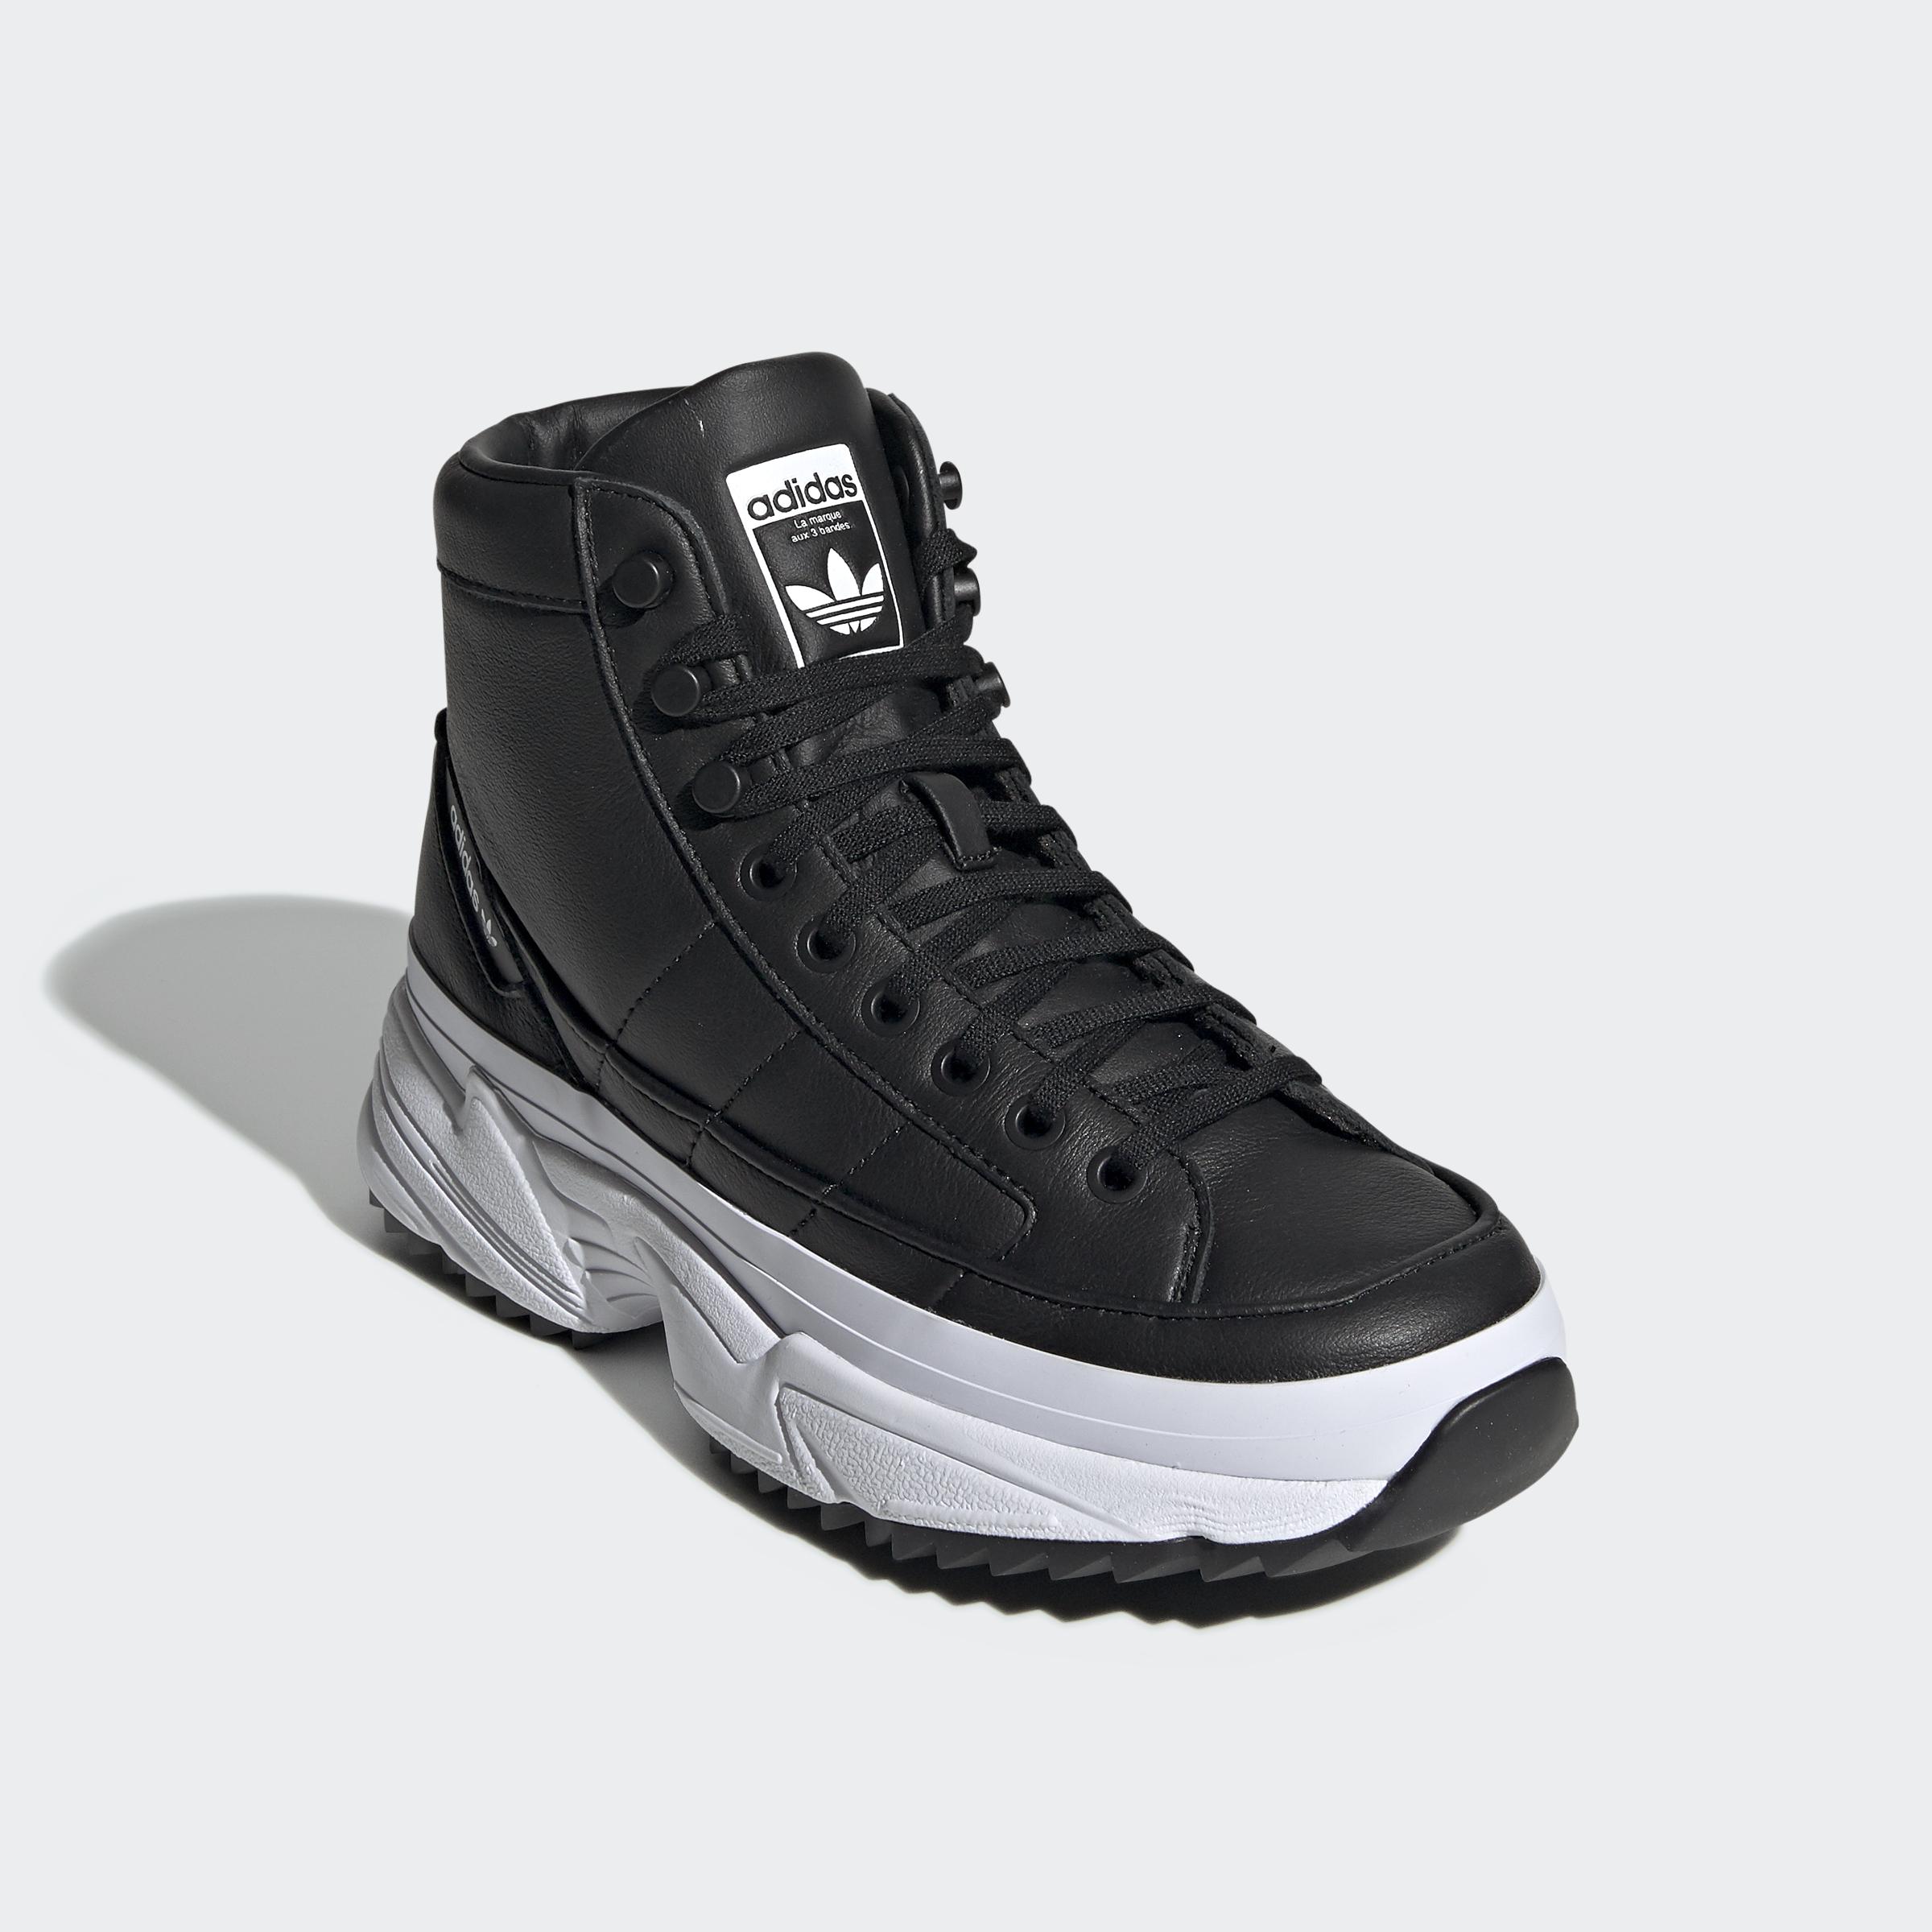 adidas-Kiellor-Xtra-Boots-Women-039-s-Boots thumbnail 13